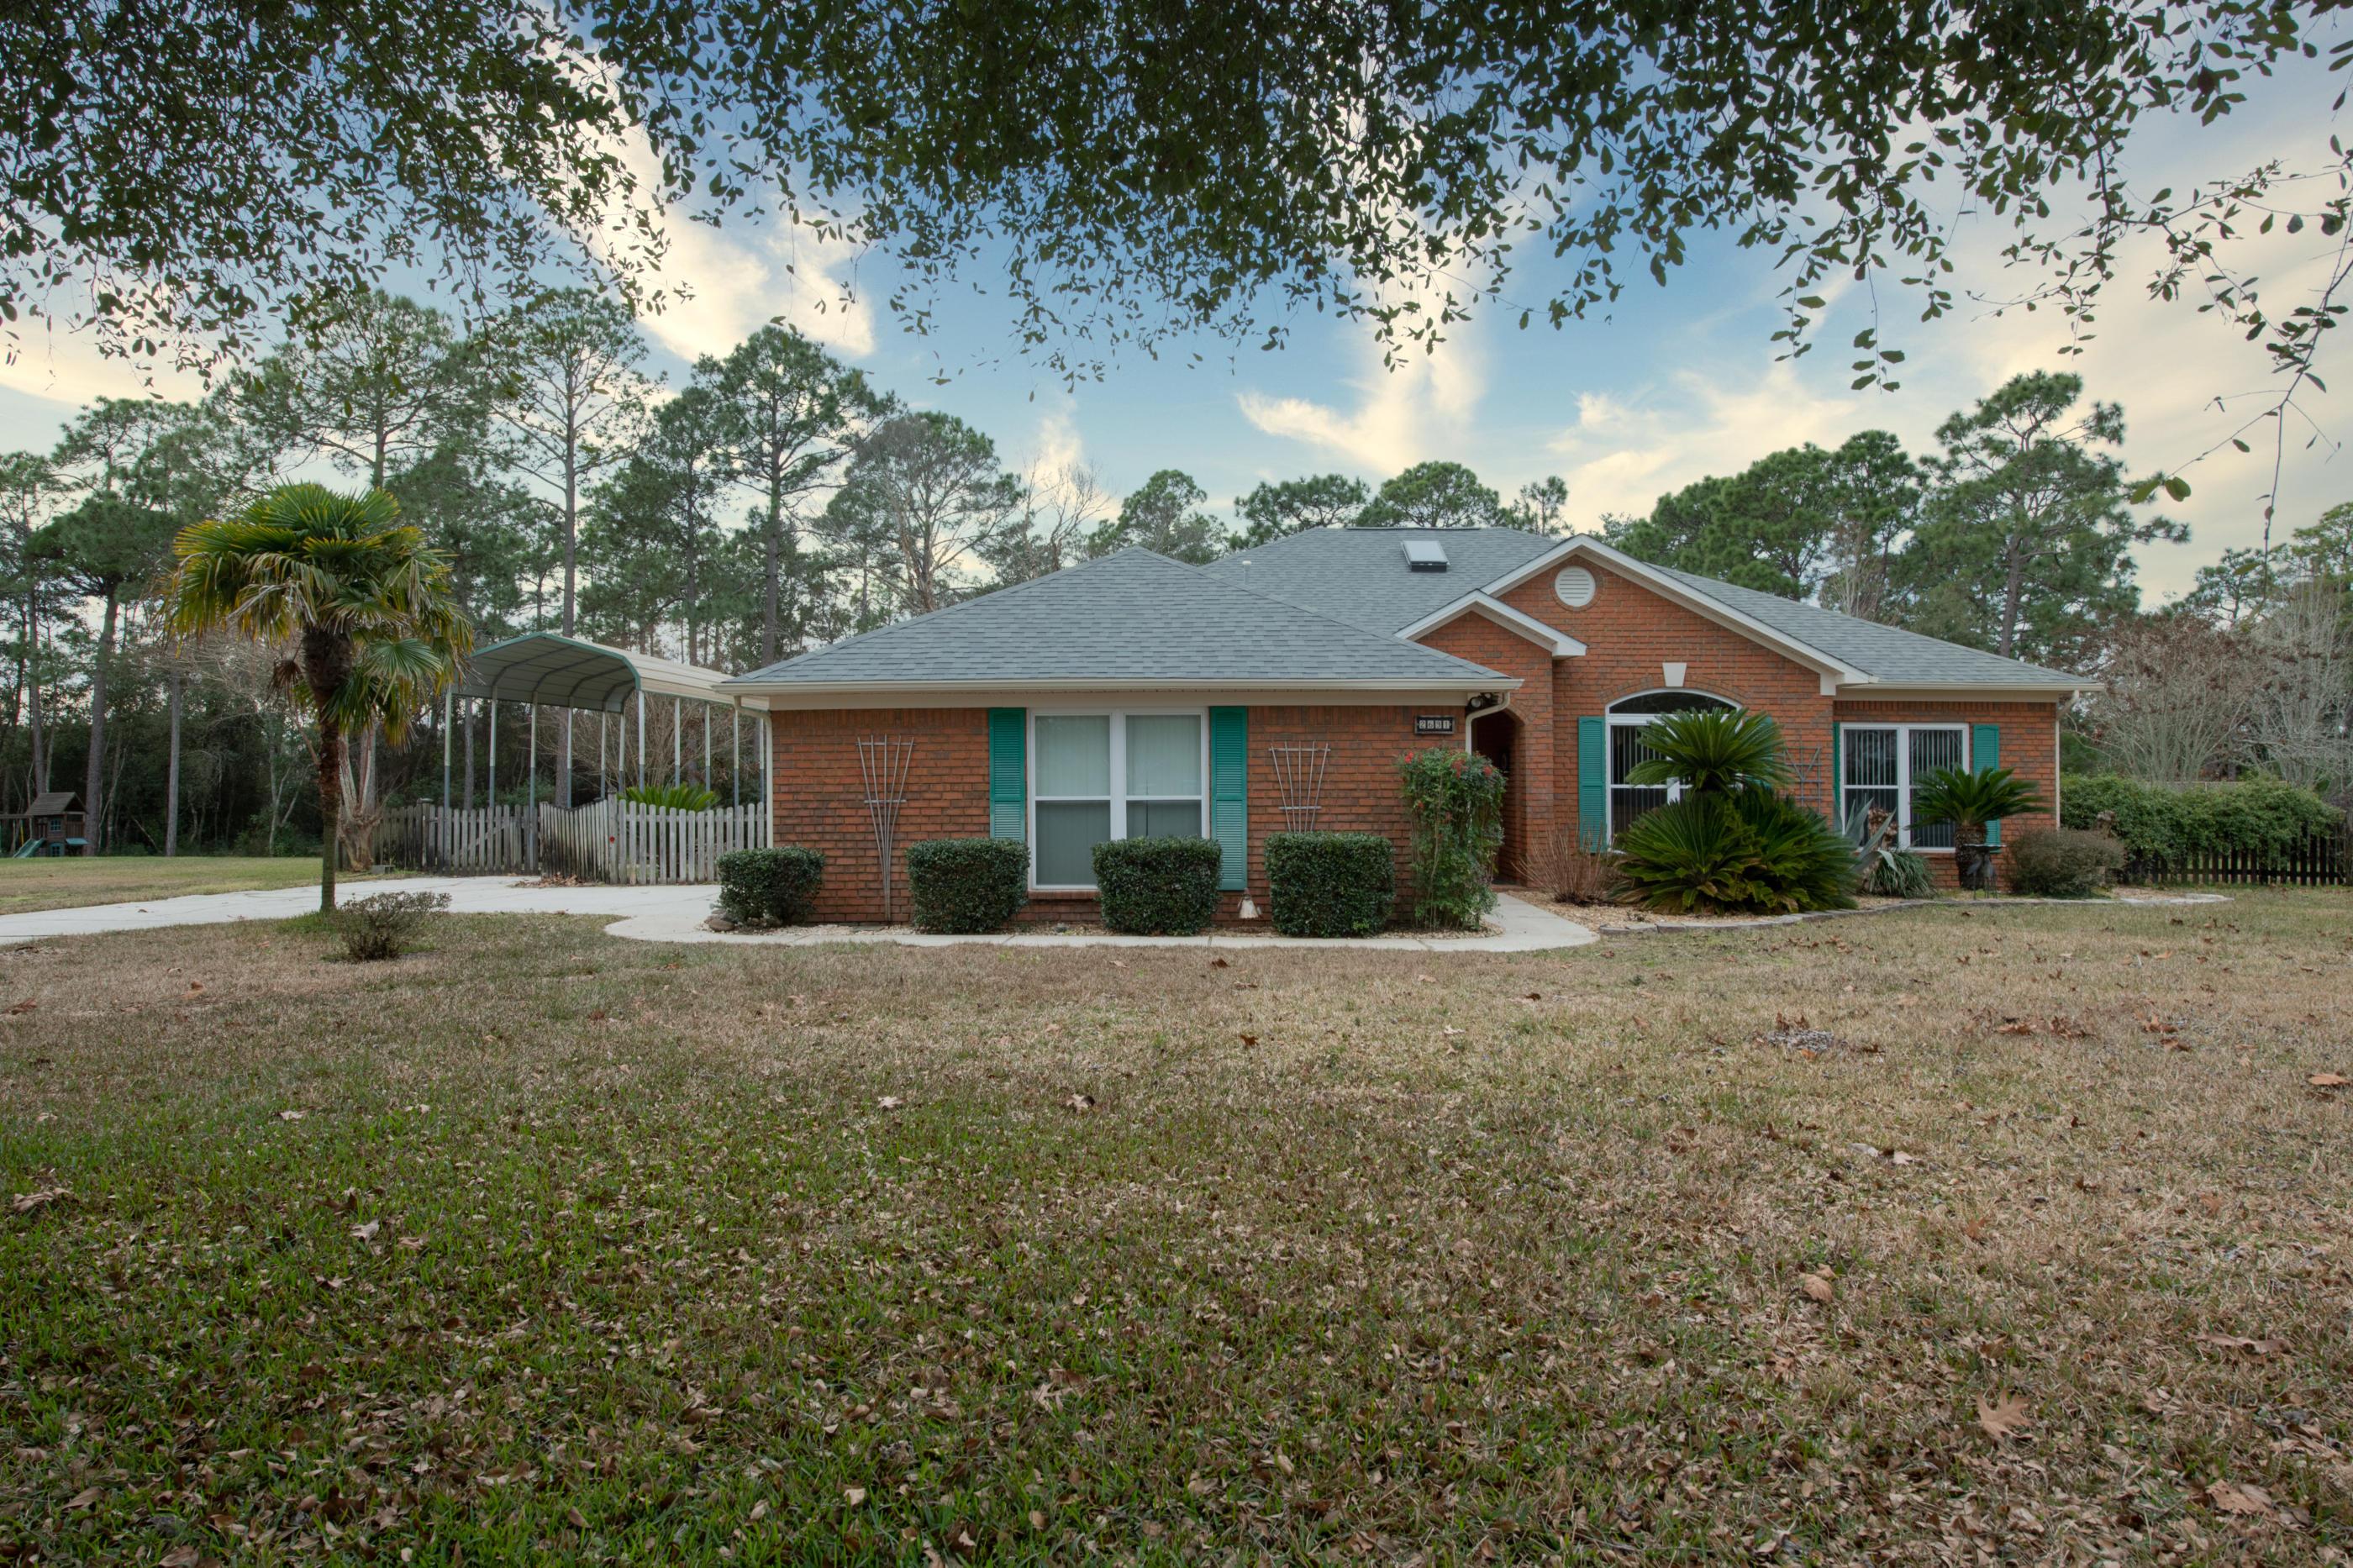 Photo of home for sale at 2631 Bob White, Navarre FL